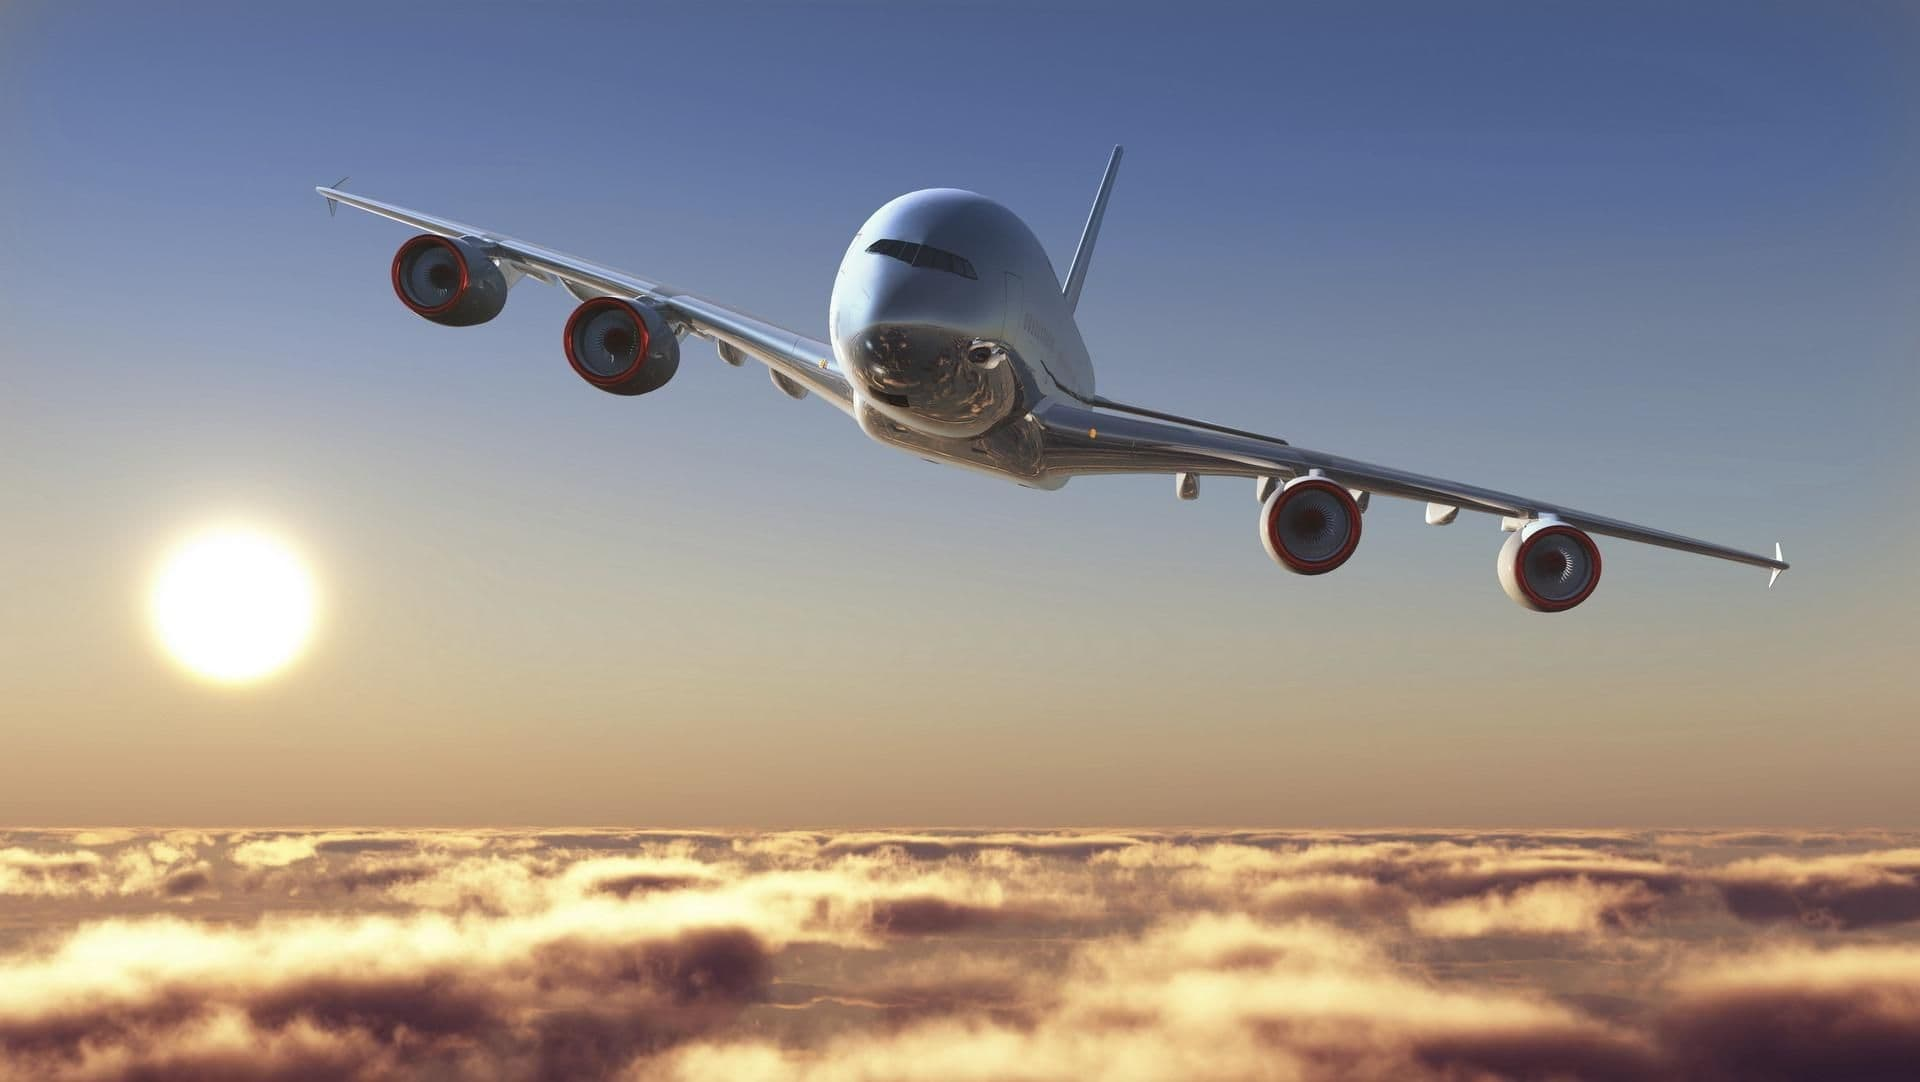 Air-plane dream meaning